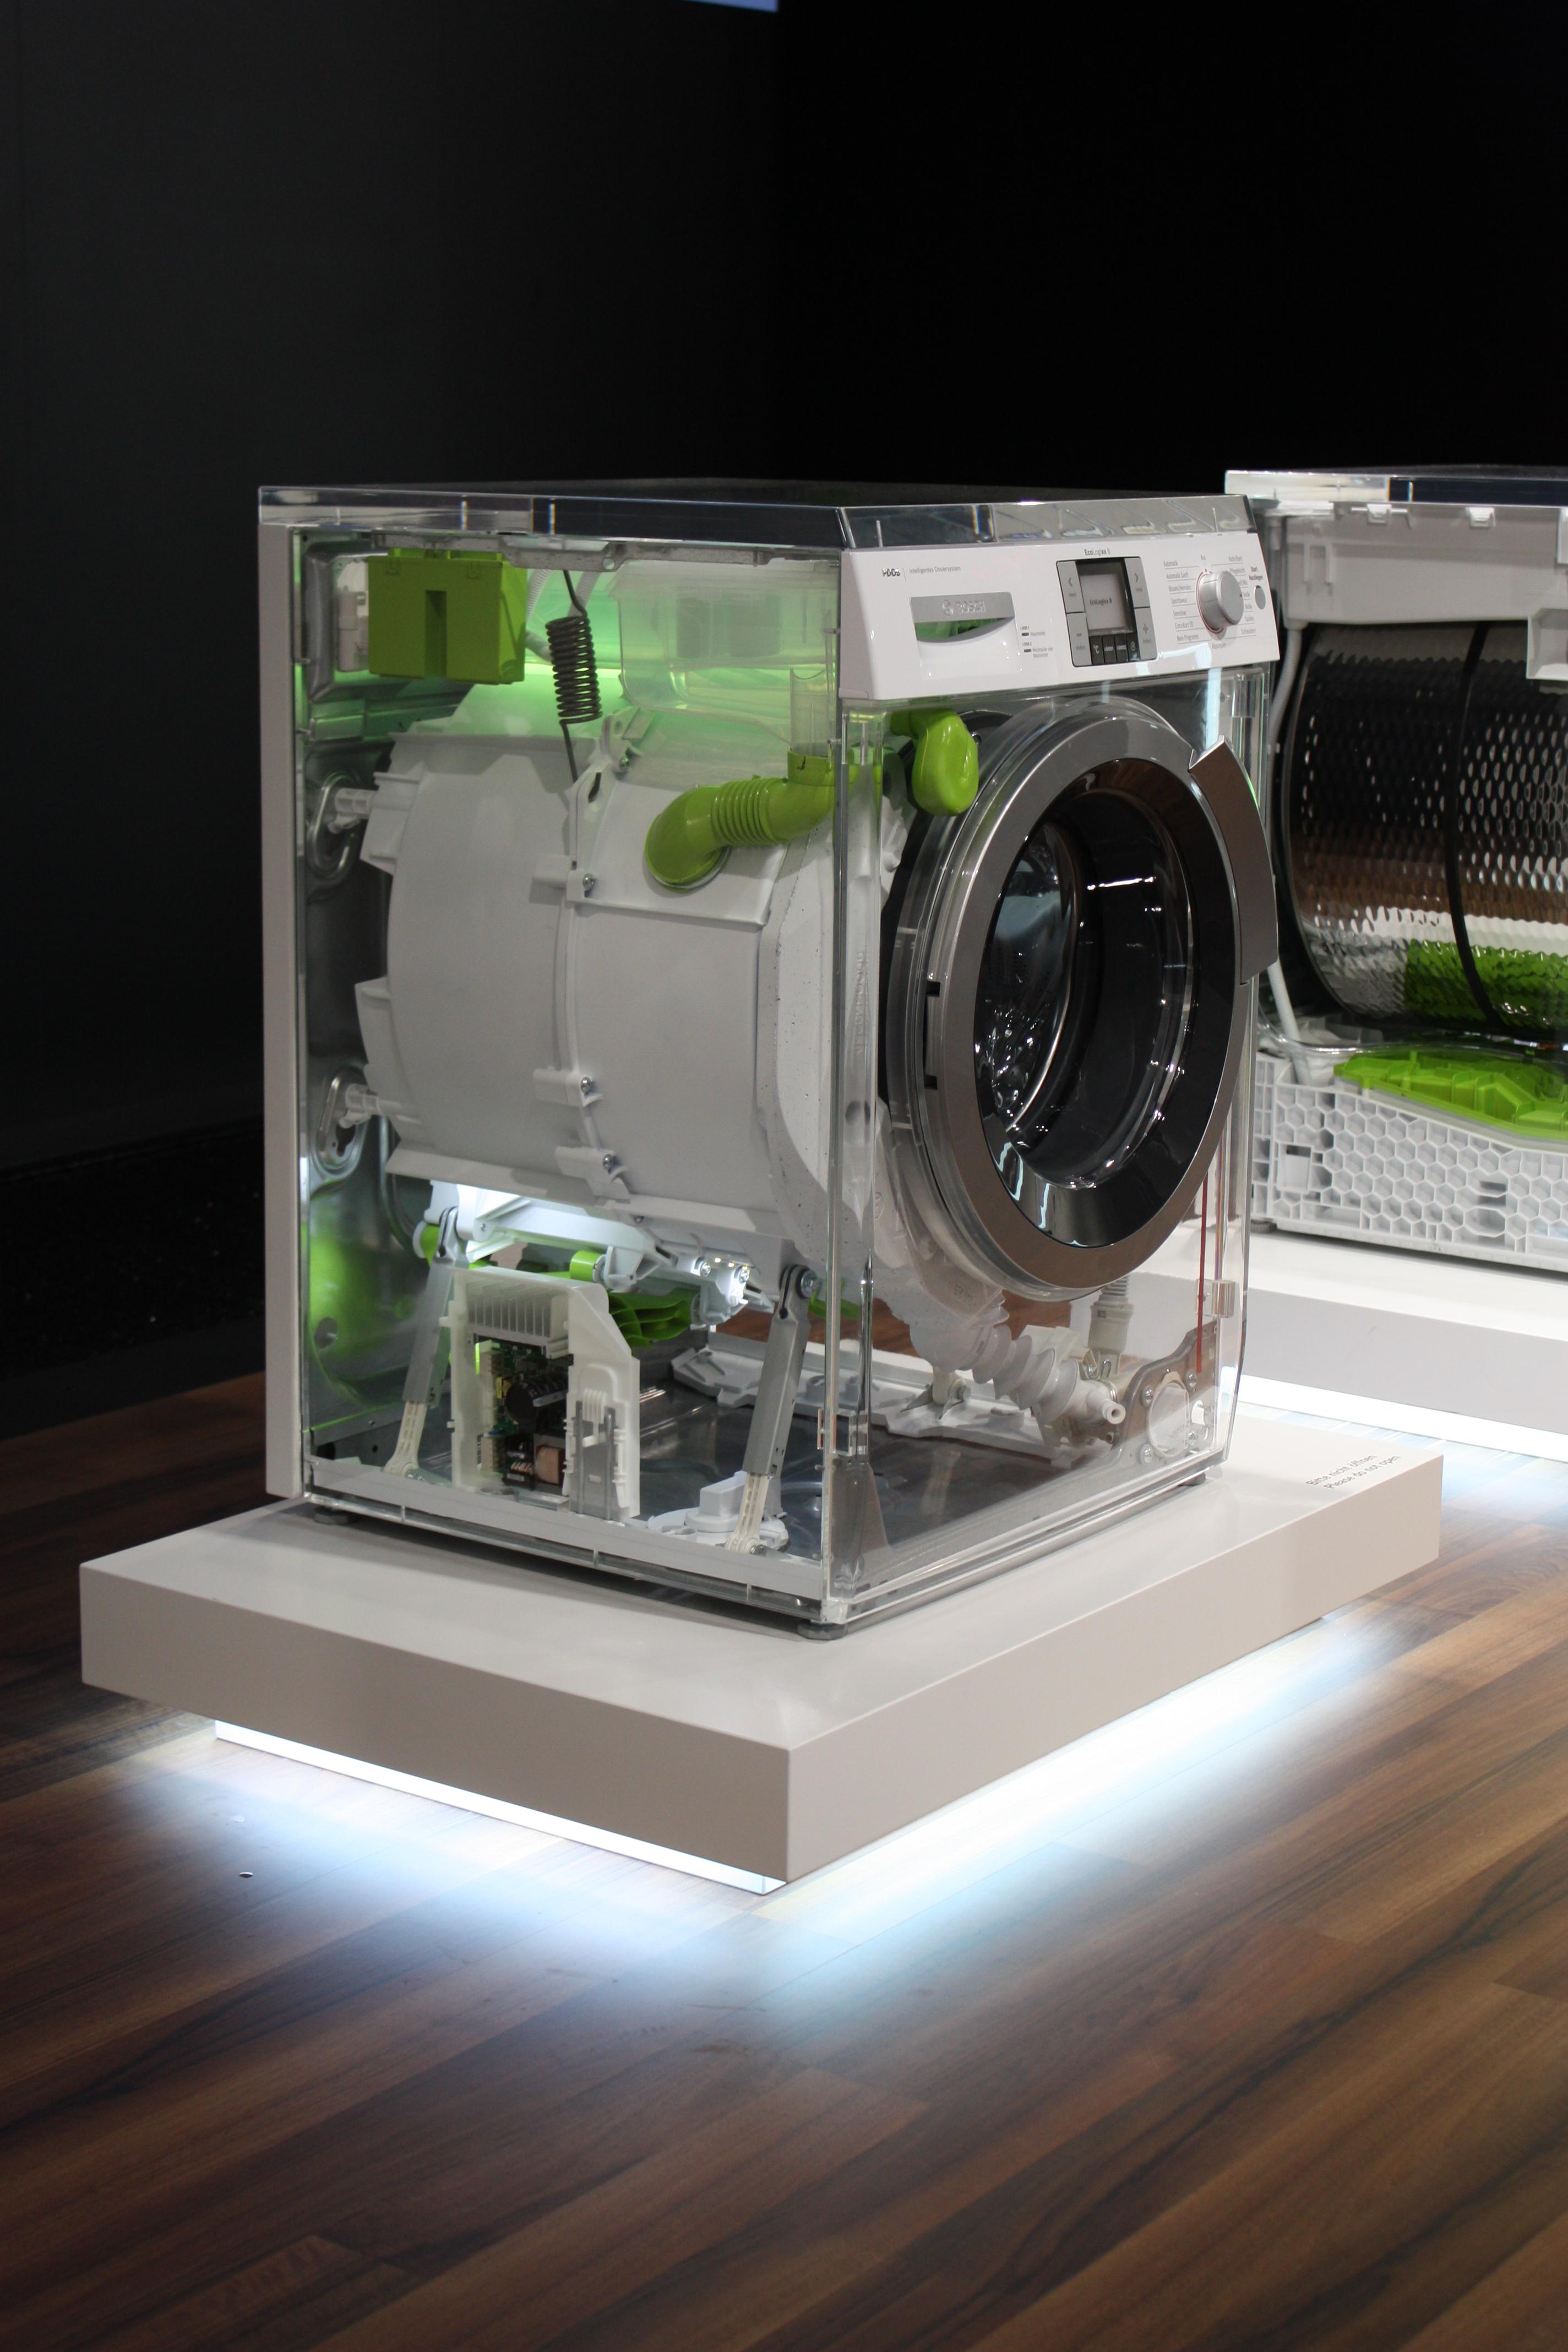 waschmaschine  wikiwand ~ Waschmaschine Yorckstr Berlin